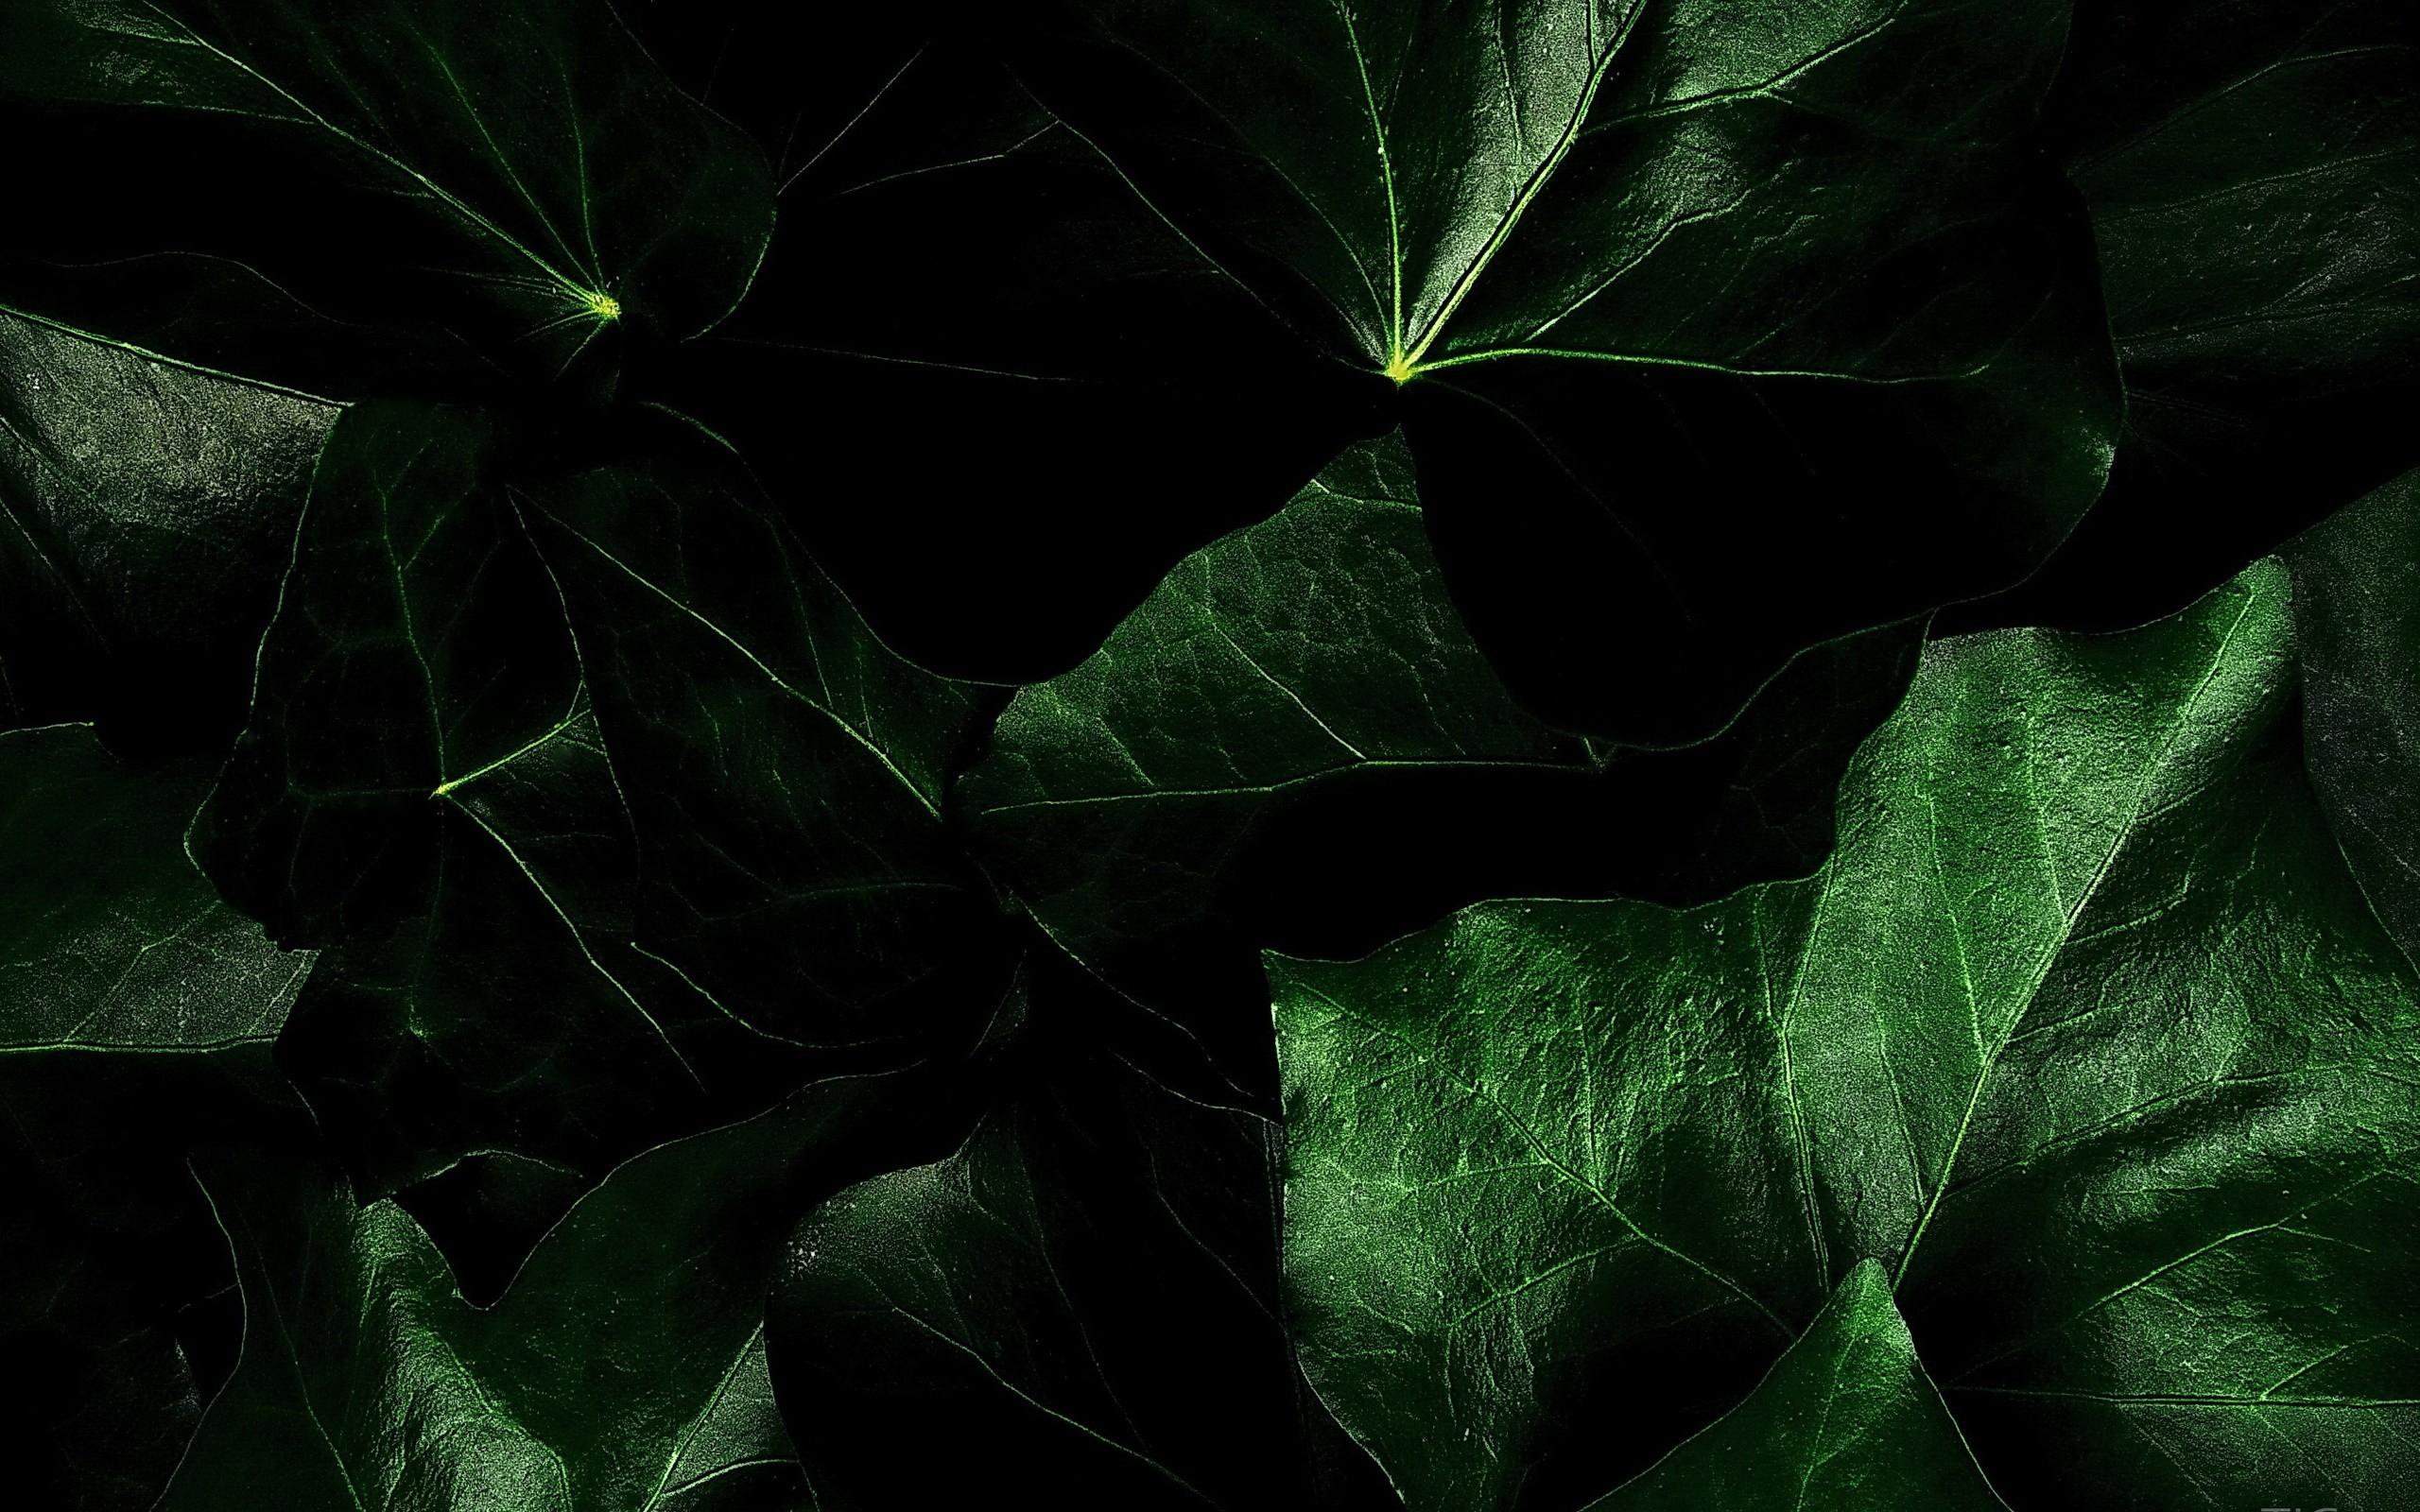 Dark Green Background Wallpaper (69+ images)